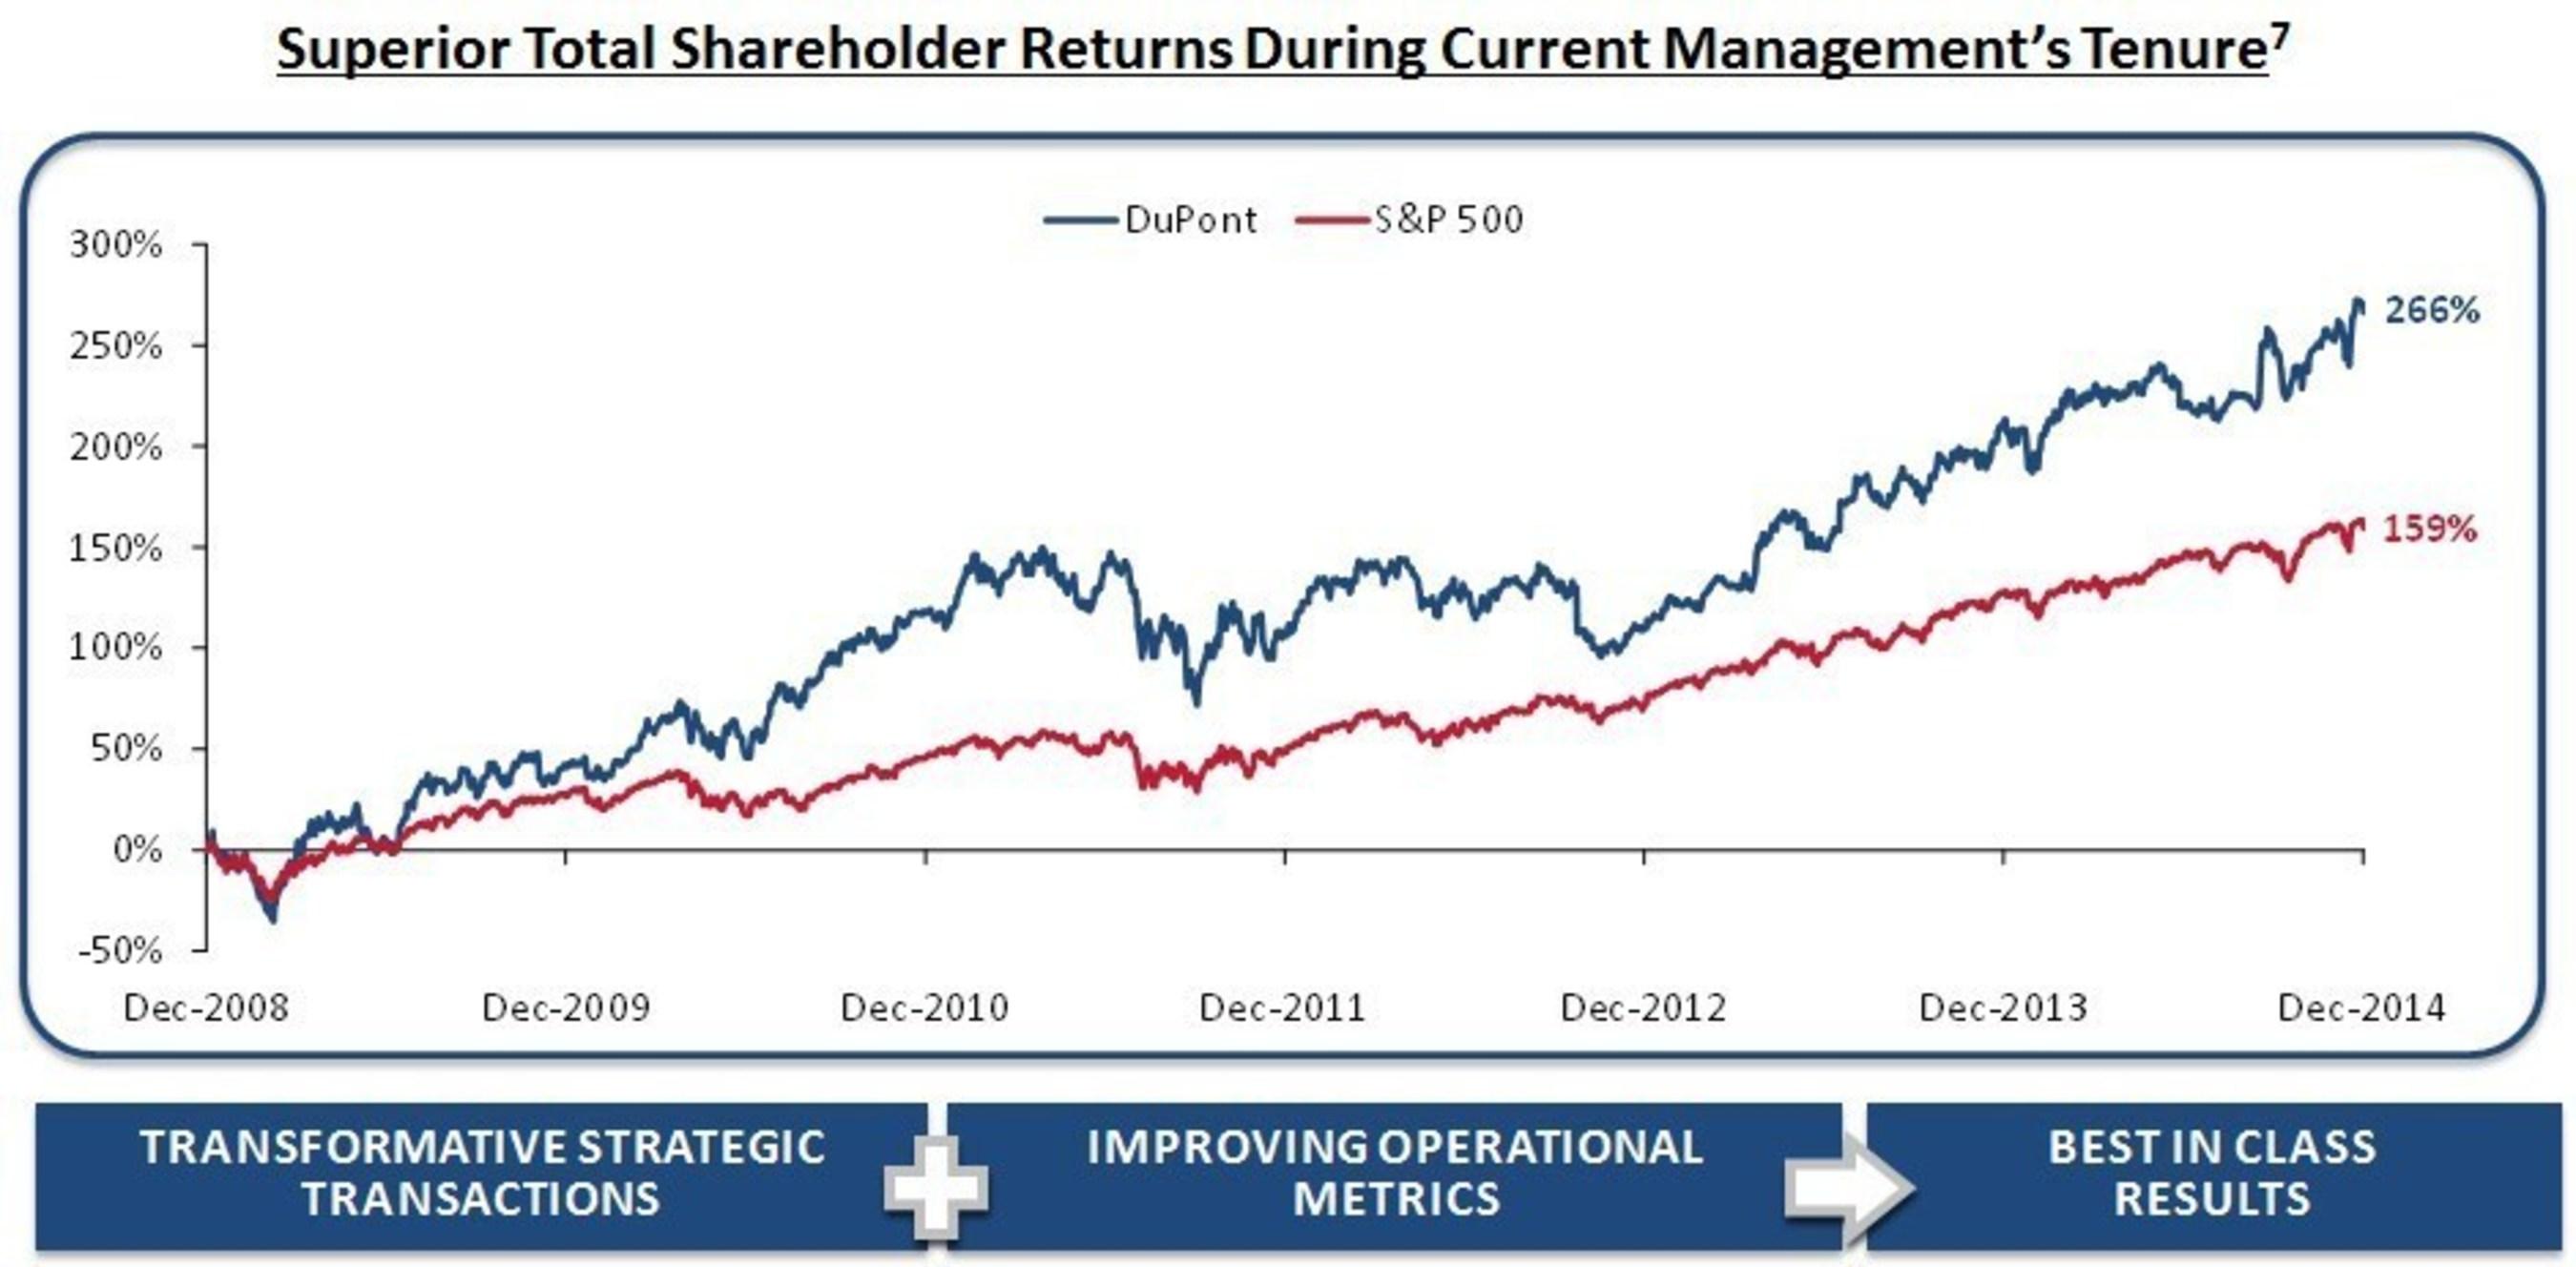 Superior Total Shareholder Returns During Current Management's Tenure